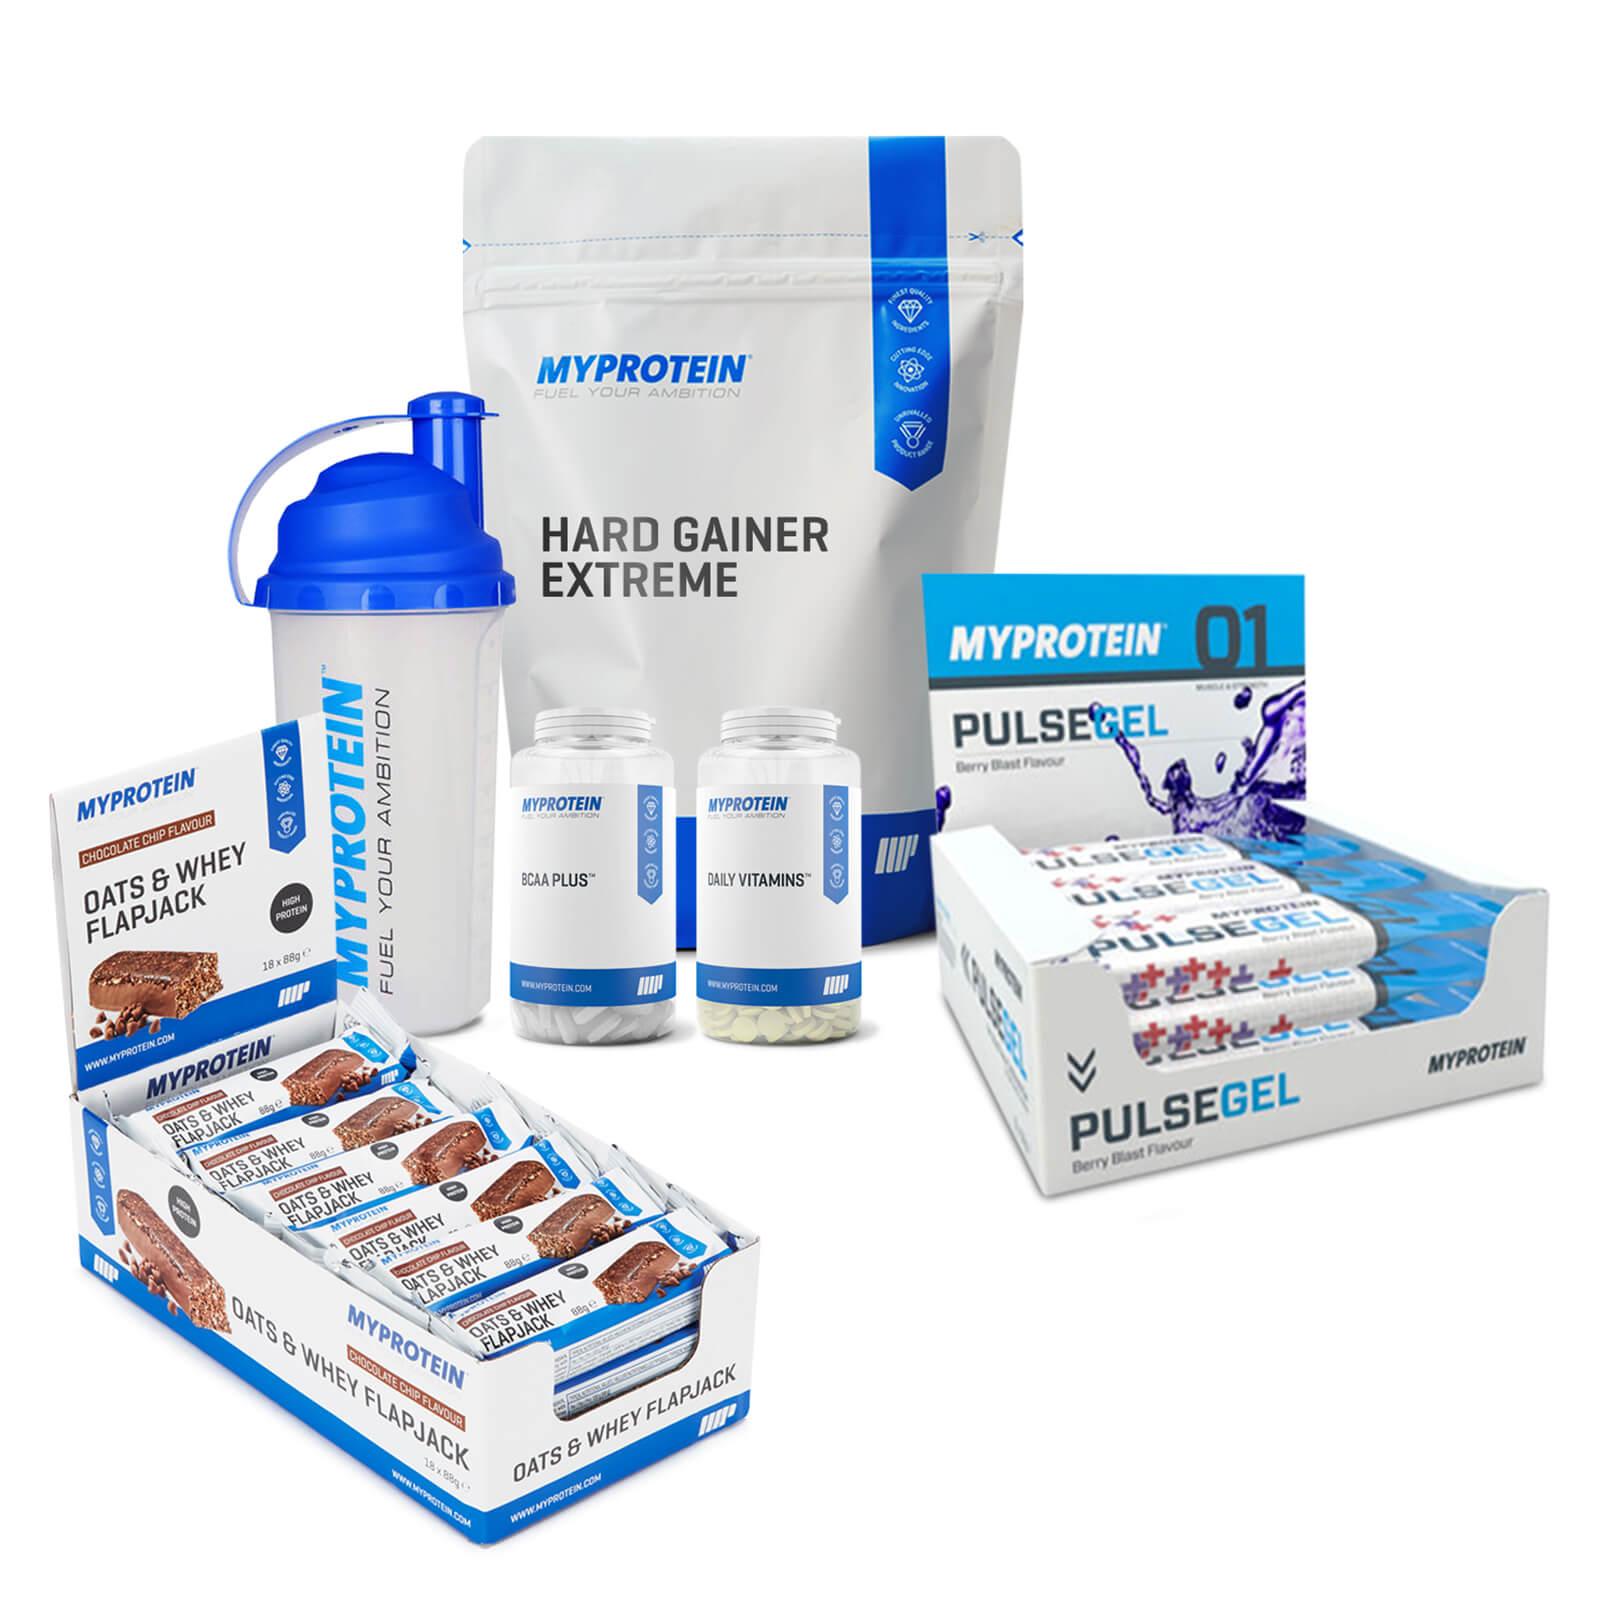 Myprotein Mass Gain & Bulking Bundle - Chocolate Peanut - Berry Blast - Chocolate Smooth